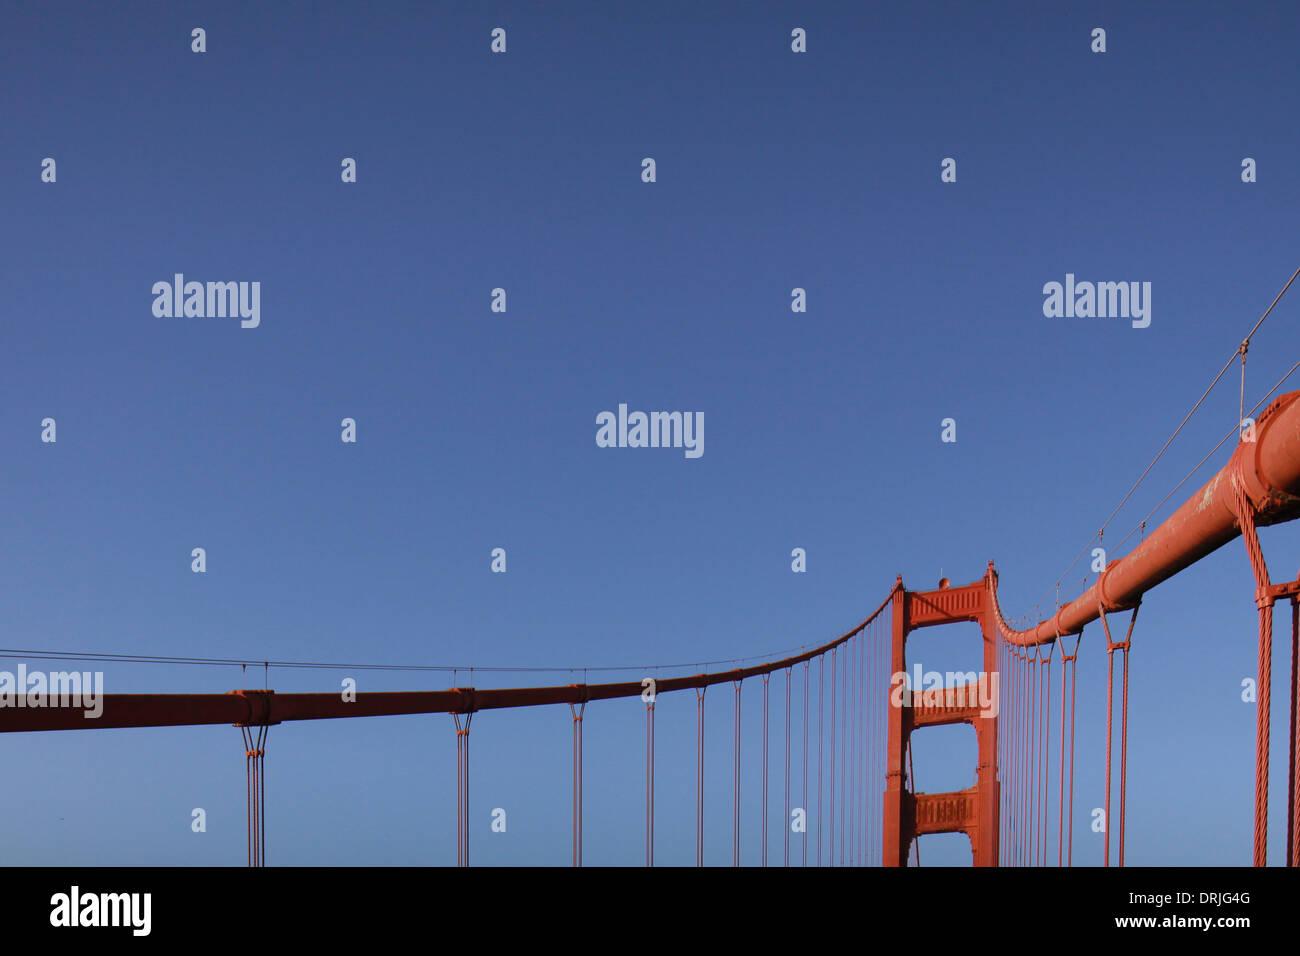 Golden Gate Bridge San Francisco, California - Stock Image